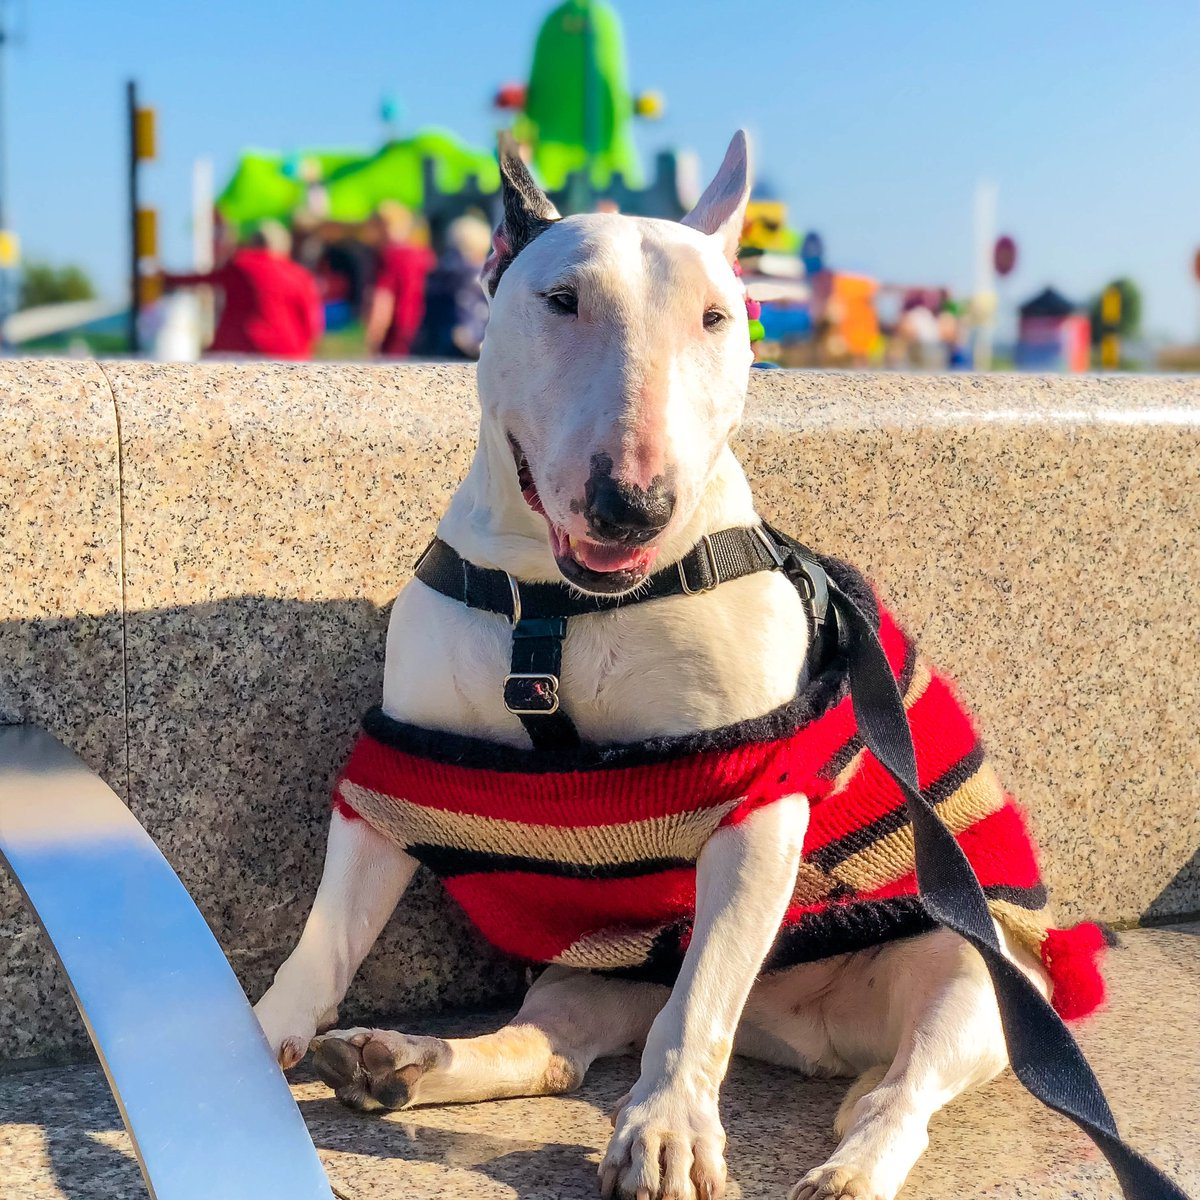 It's always sunny where I am  . . . . #greatyarmouth #yarmouth #norwich #dogs #dog #bullterrier #bullterriers #dogsoftwitter #dogsofinstagram #doggo #puppers #dogtravel #traveldog<br>http://pic.twitter.com/njO1Ono4KV